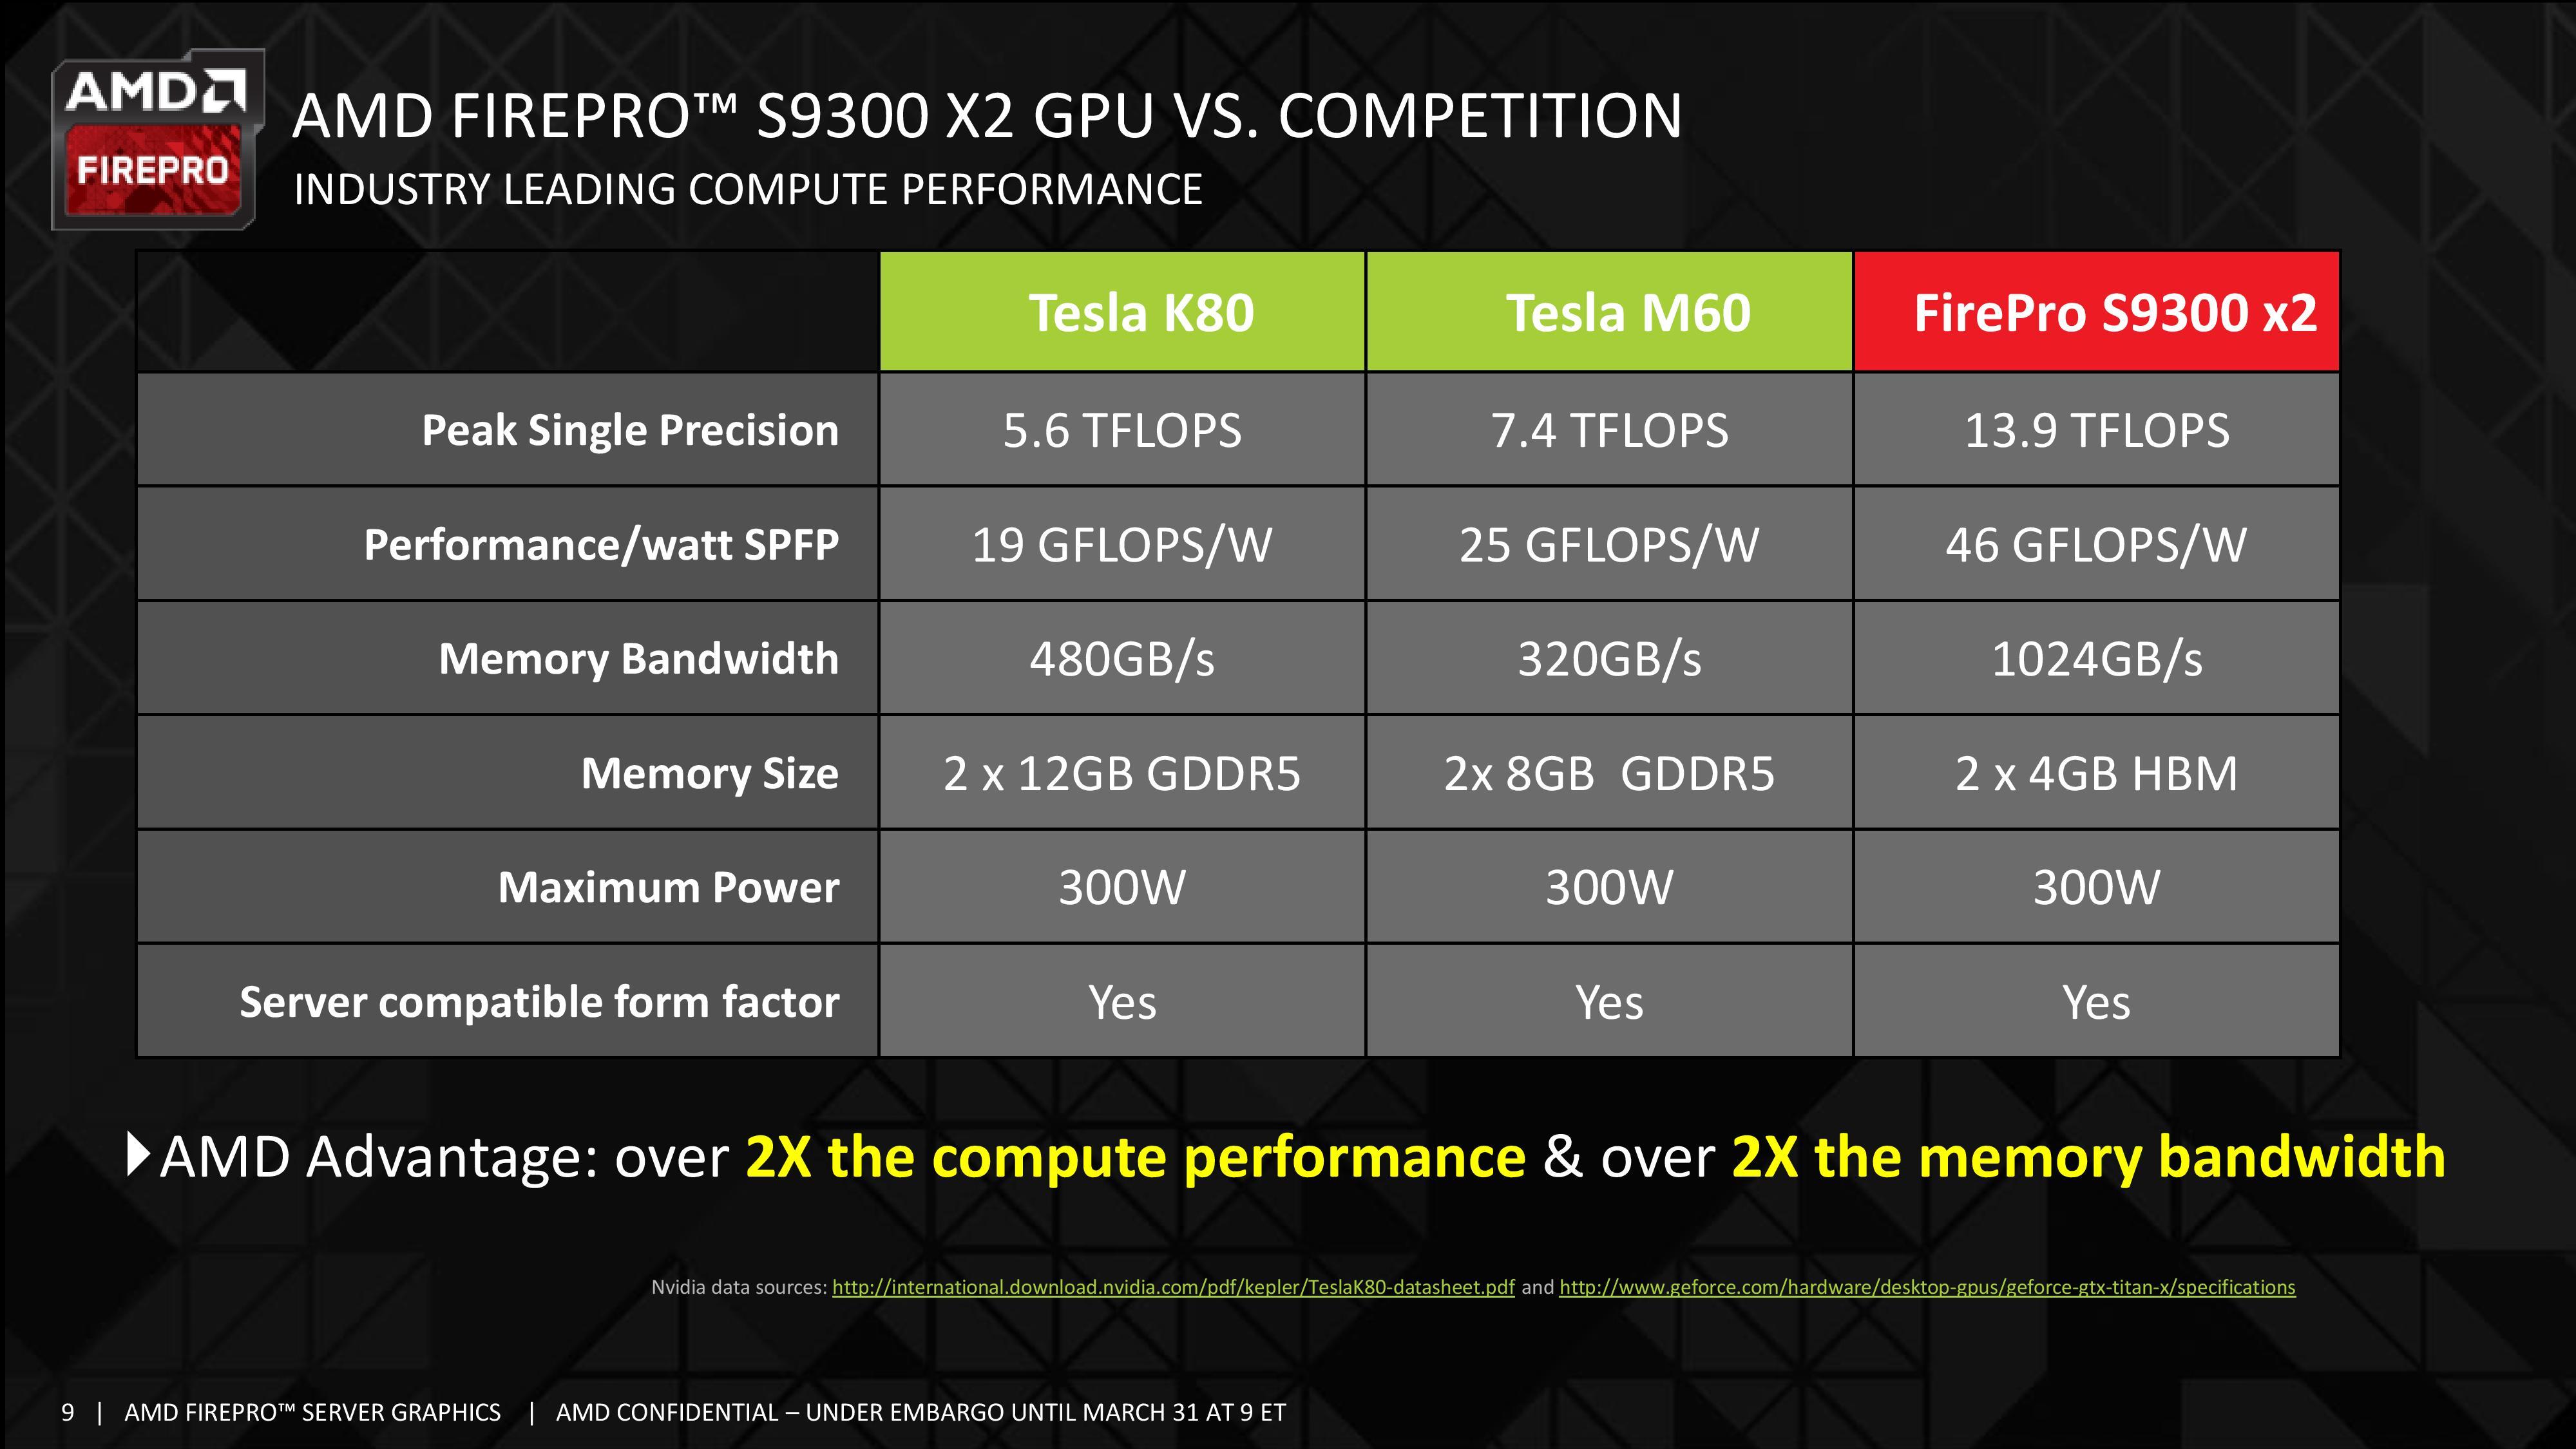 AMD FIREPRO M4170 DRIVER